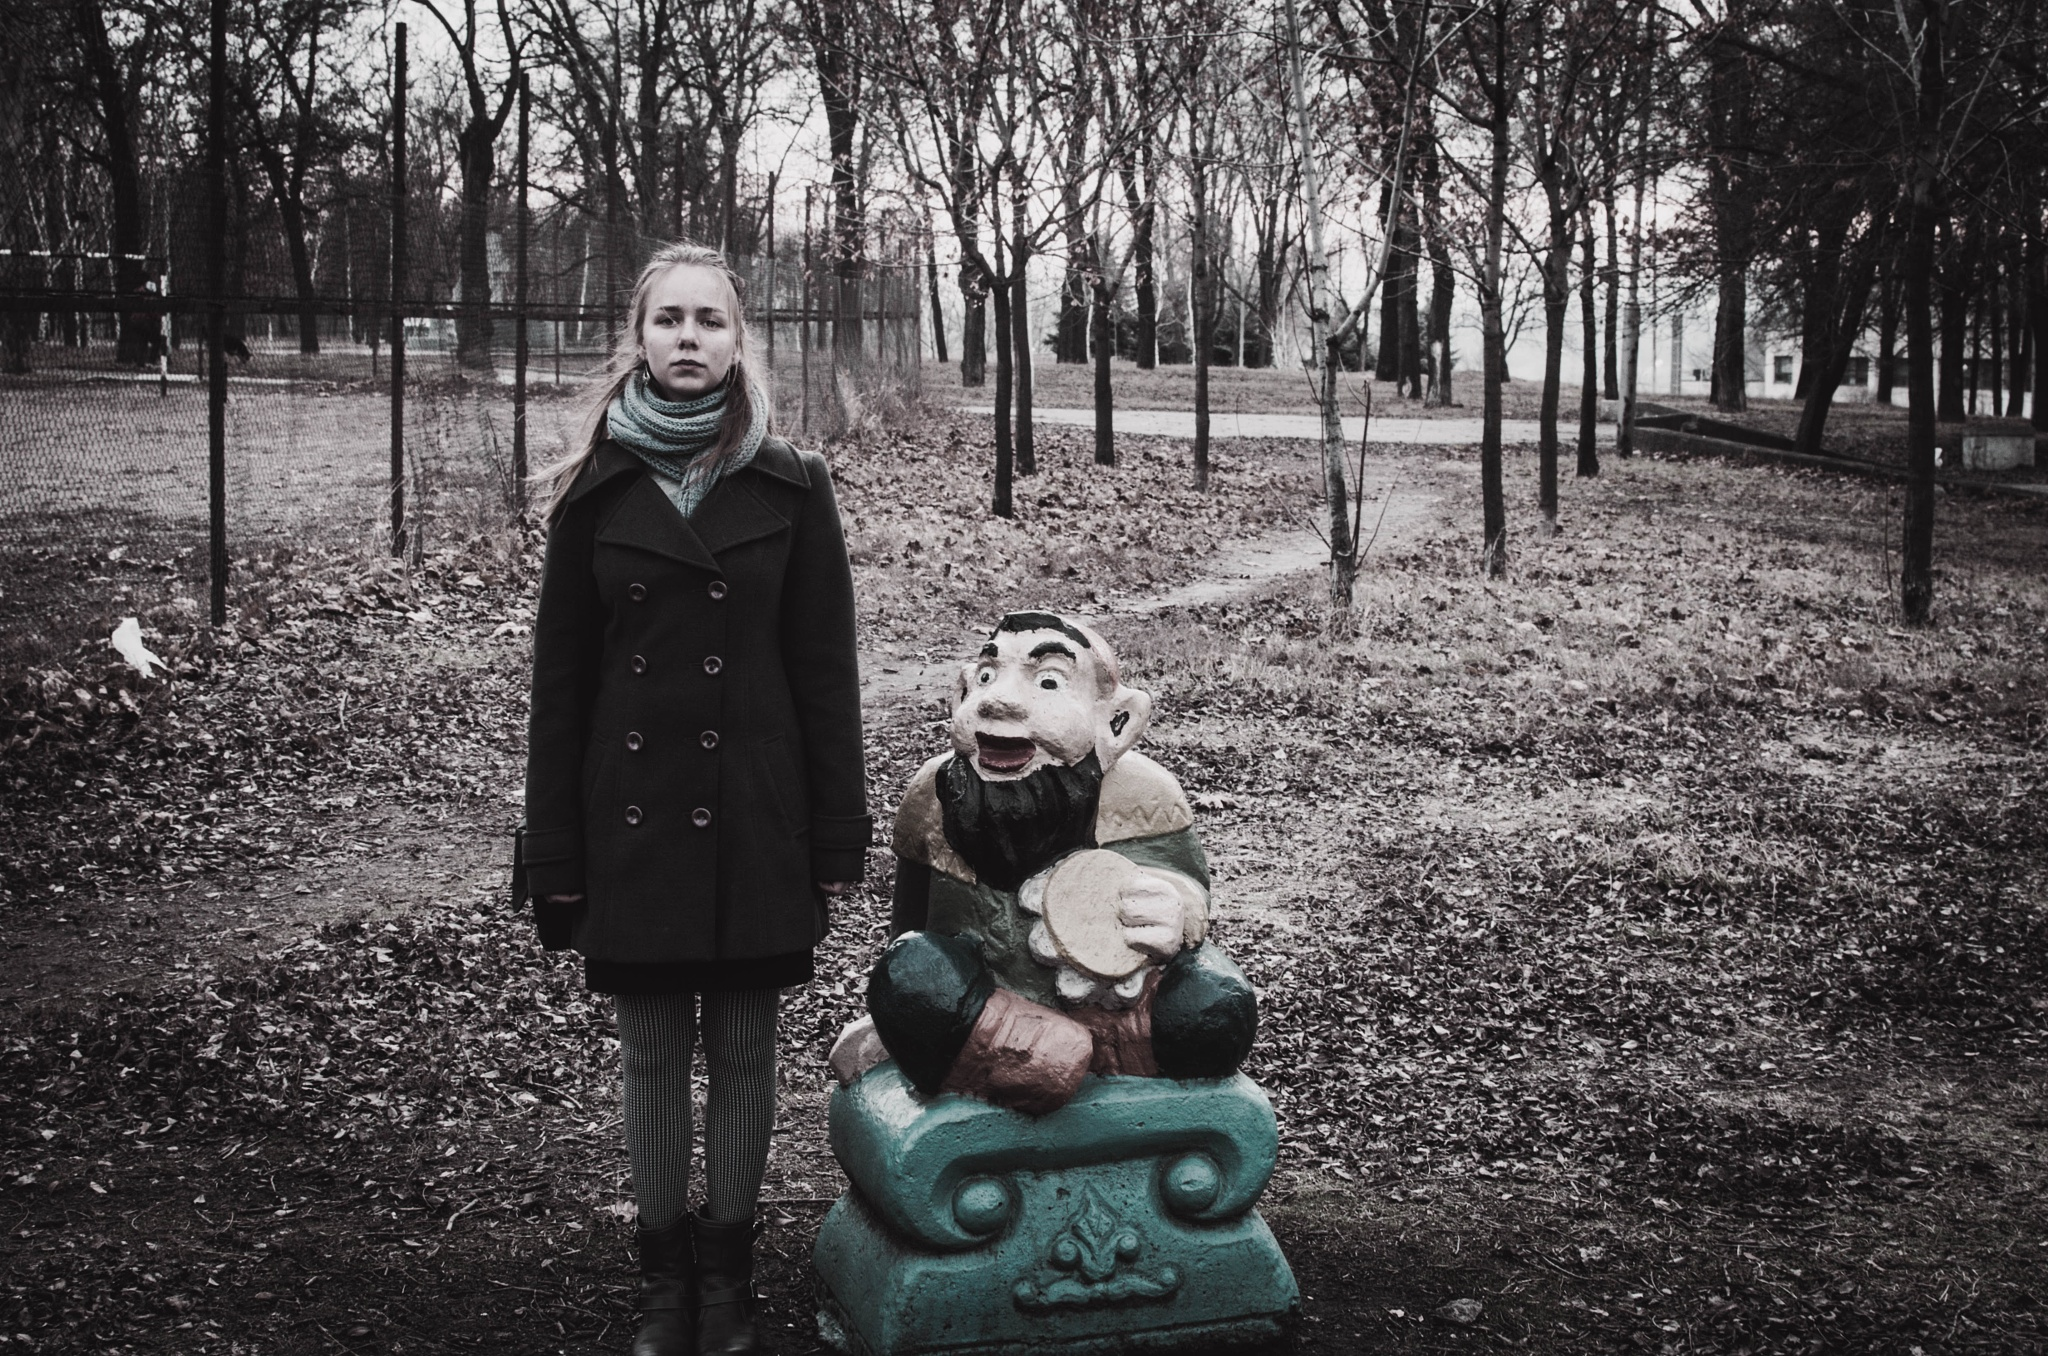 Strange Gnome  by Whiteviva